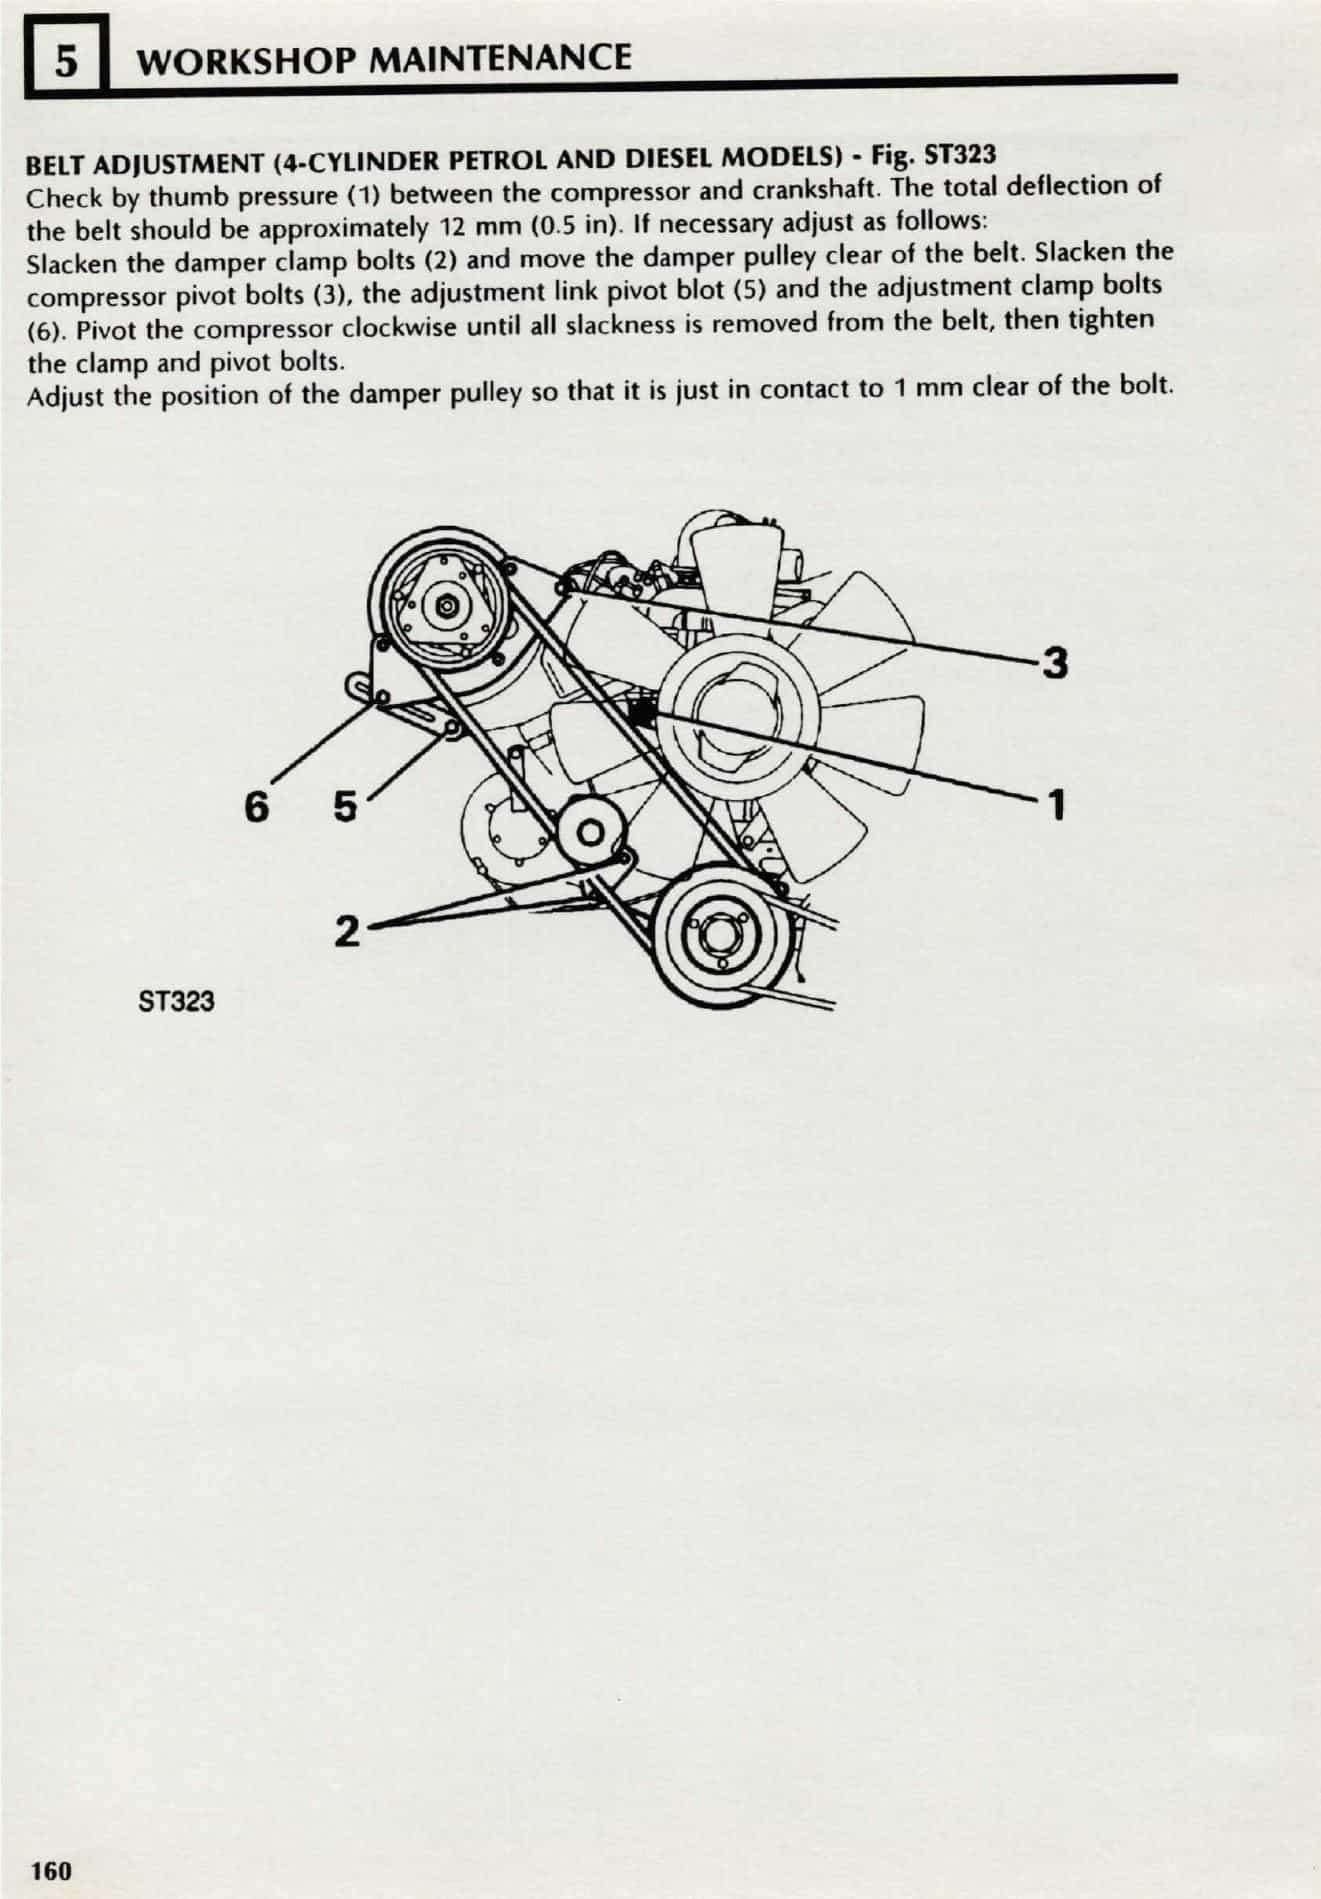 PracticalSeries: Land Rover Defender Owner's Manual